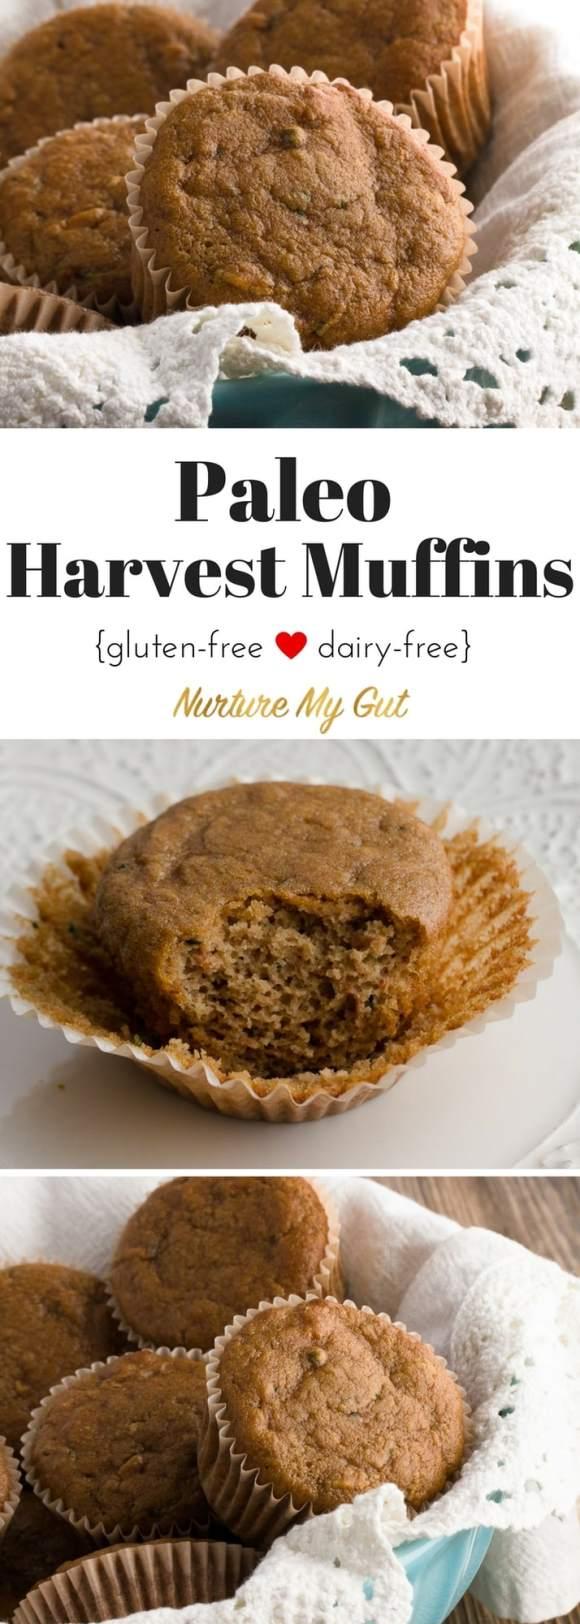 Paleo Harvest Muffins